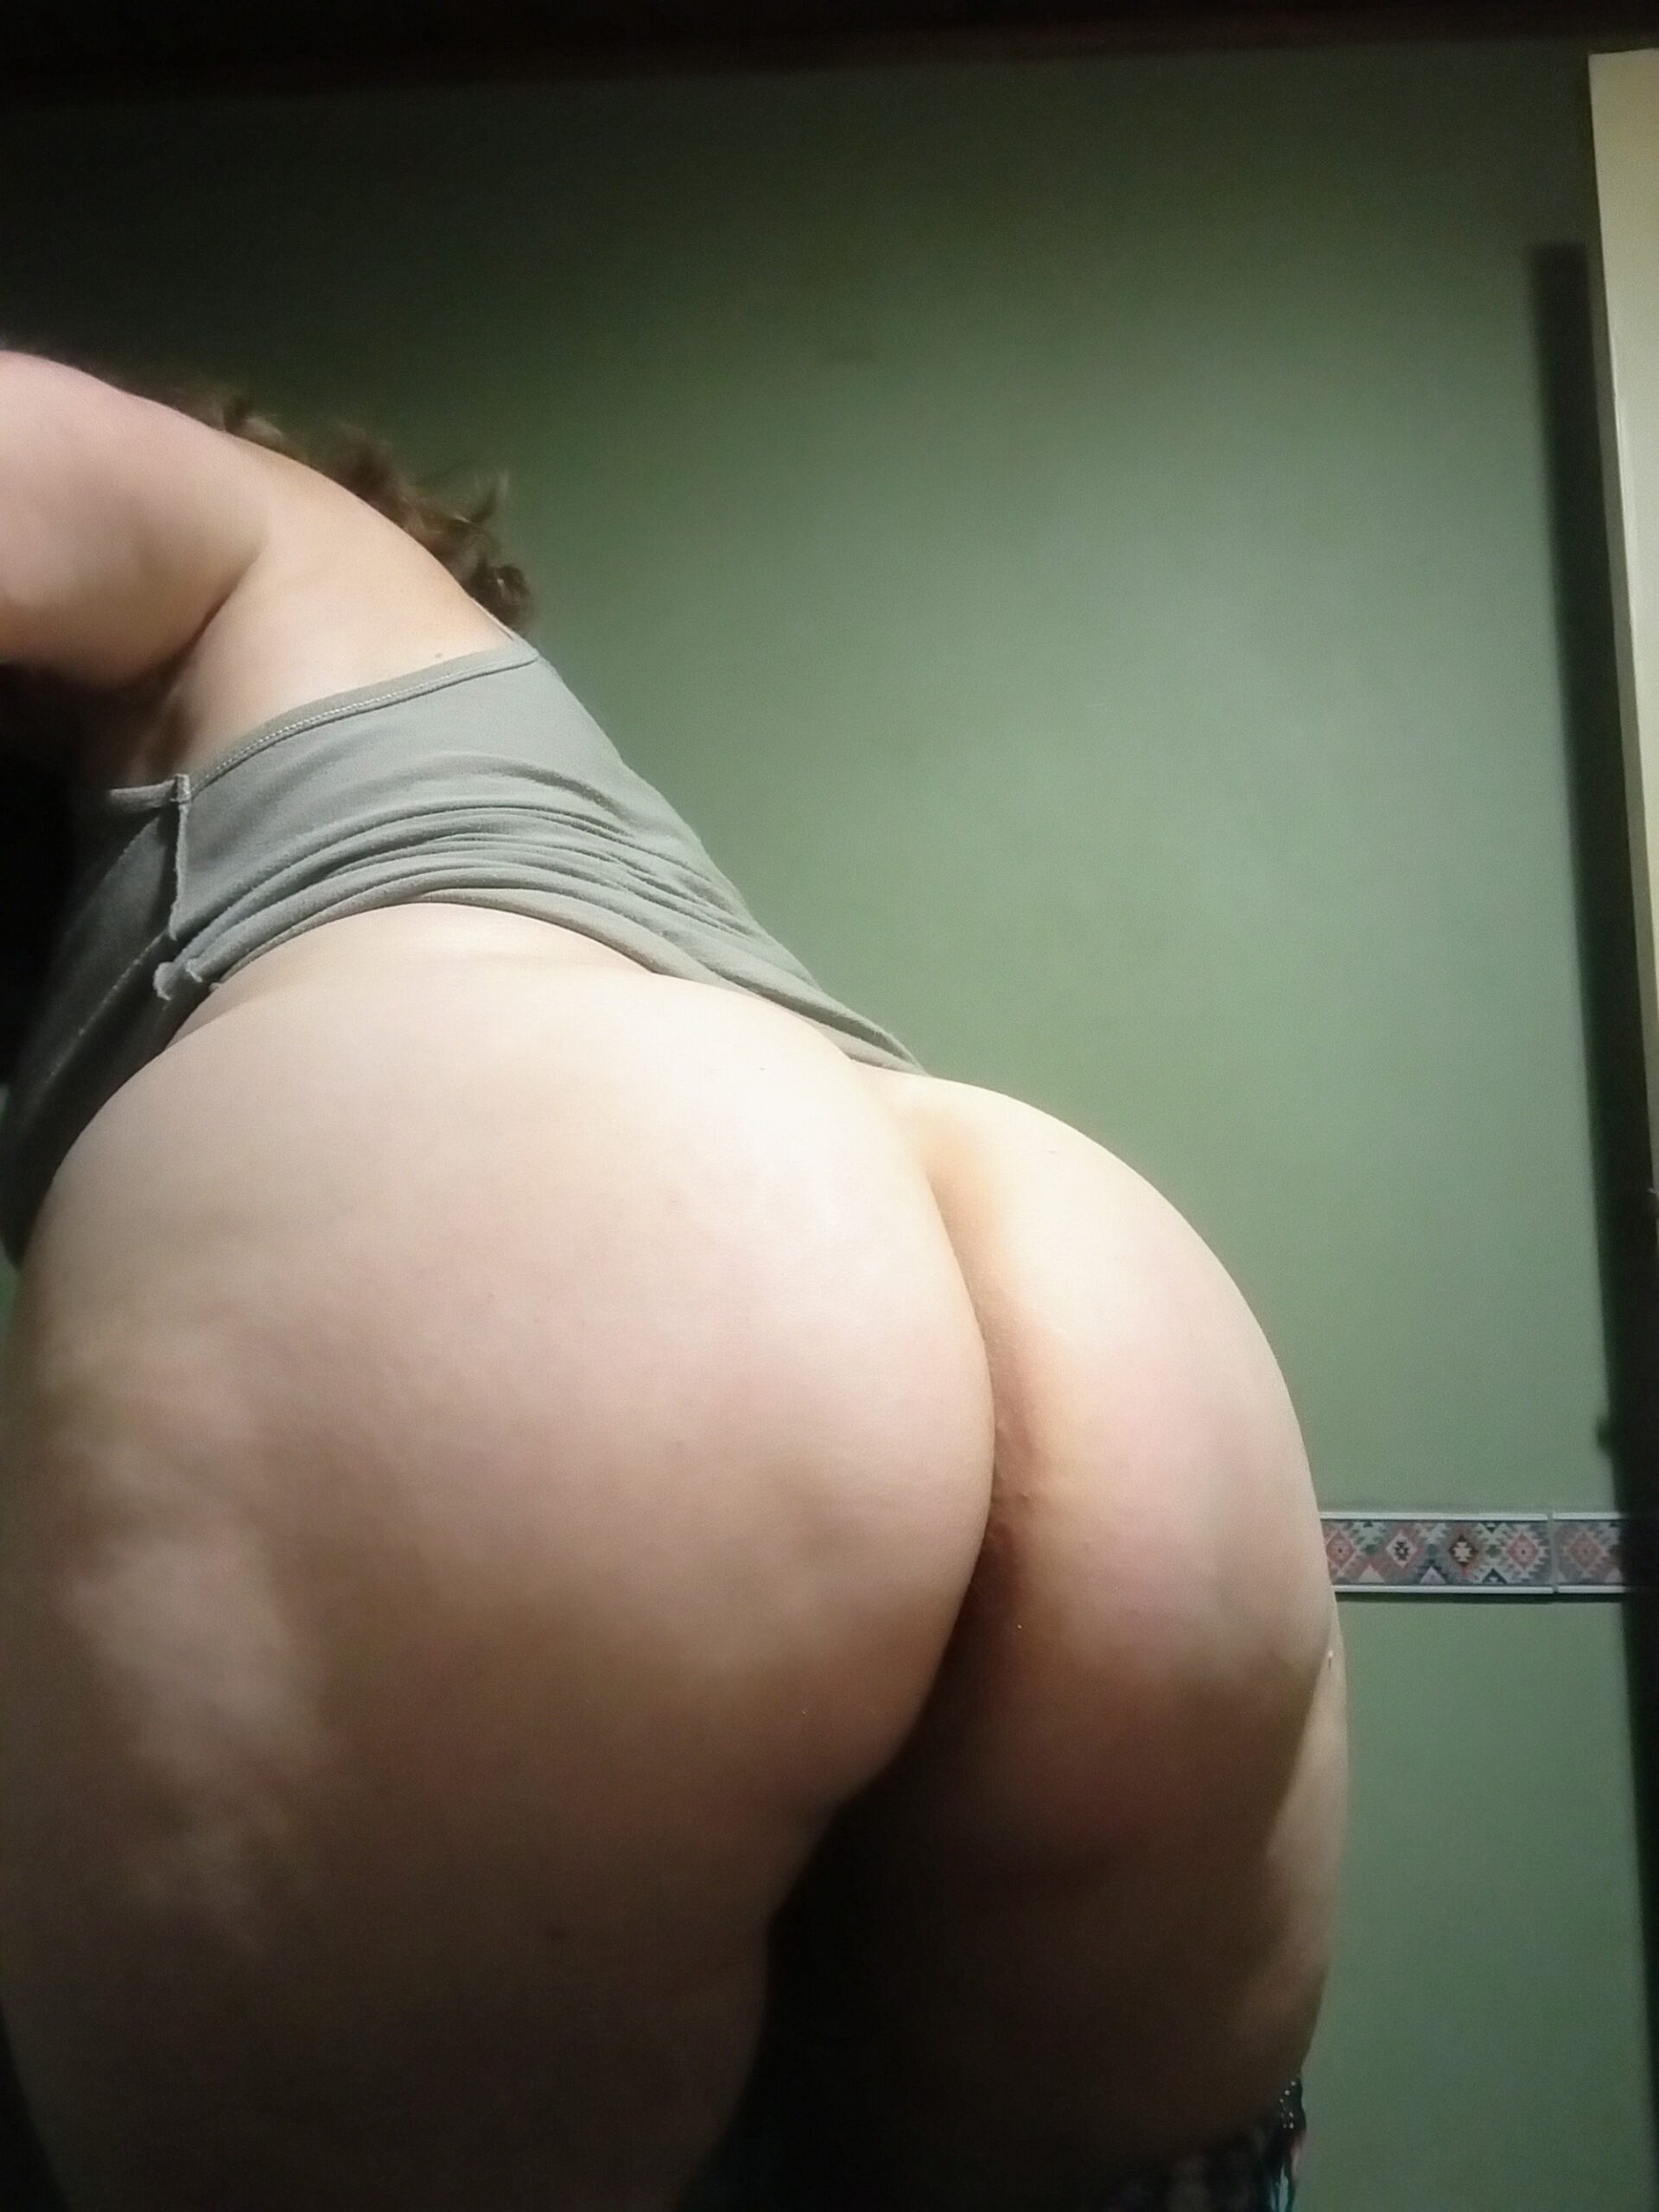 fotos gordas xxx esposas desnudas calientes